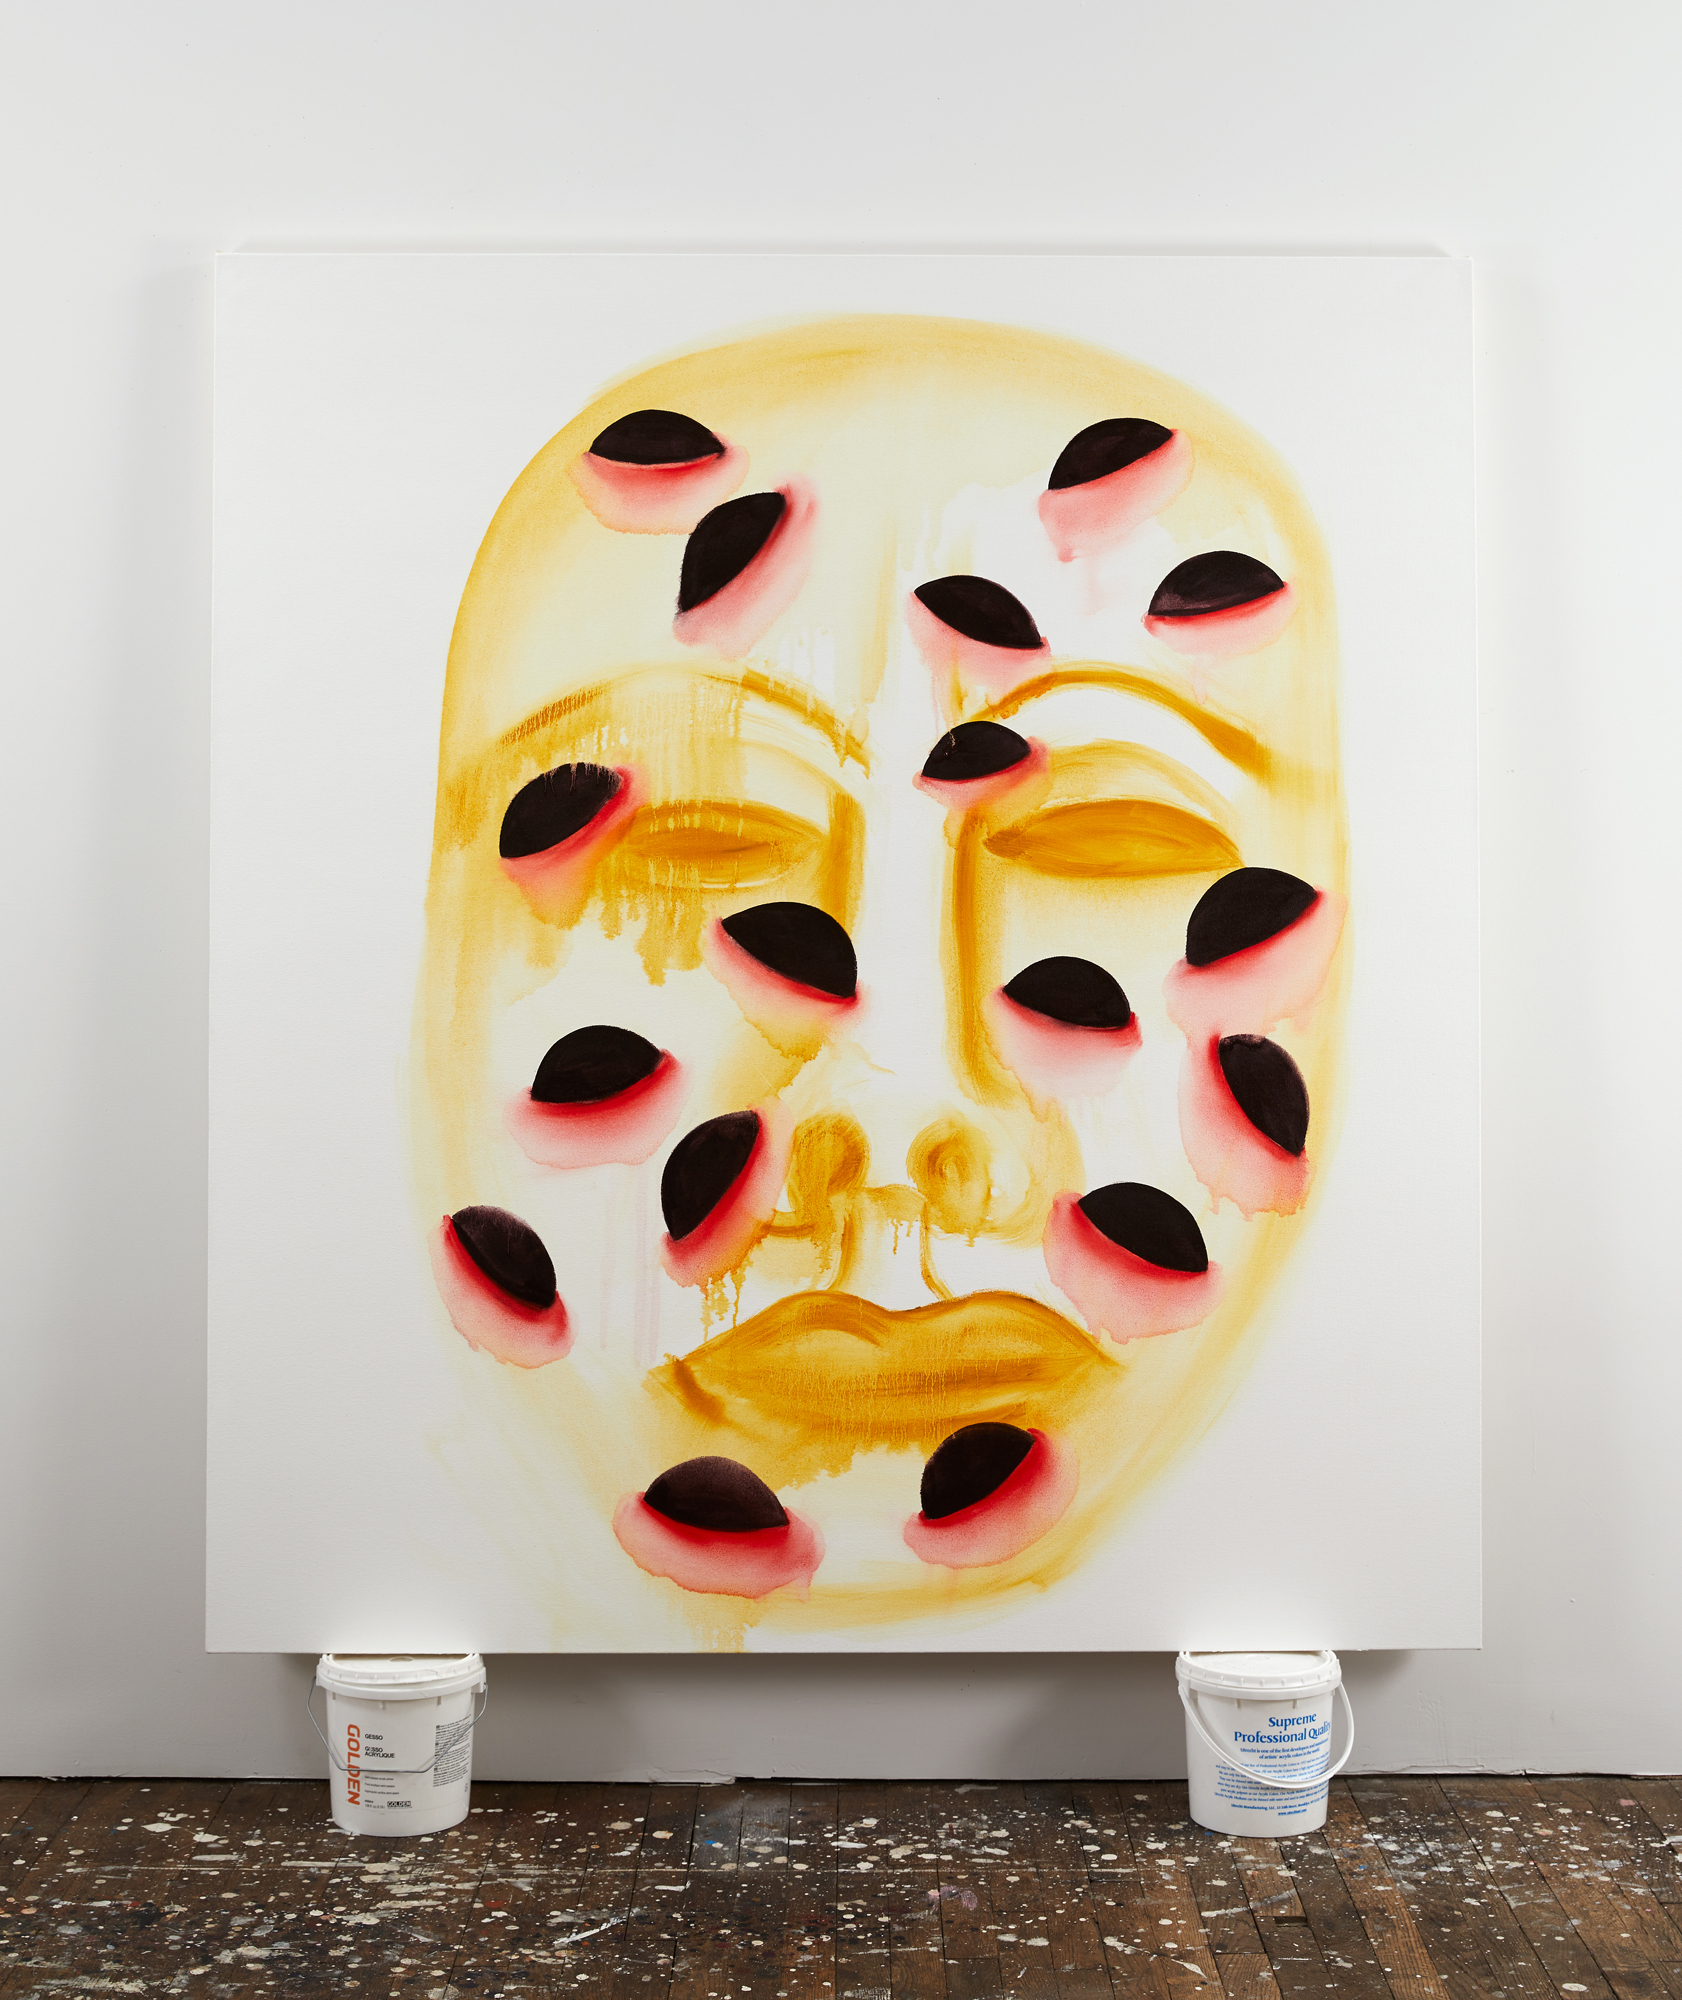 Self Portrait (samskaras), oil on canvas, 66 x 60 inches, 2017